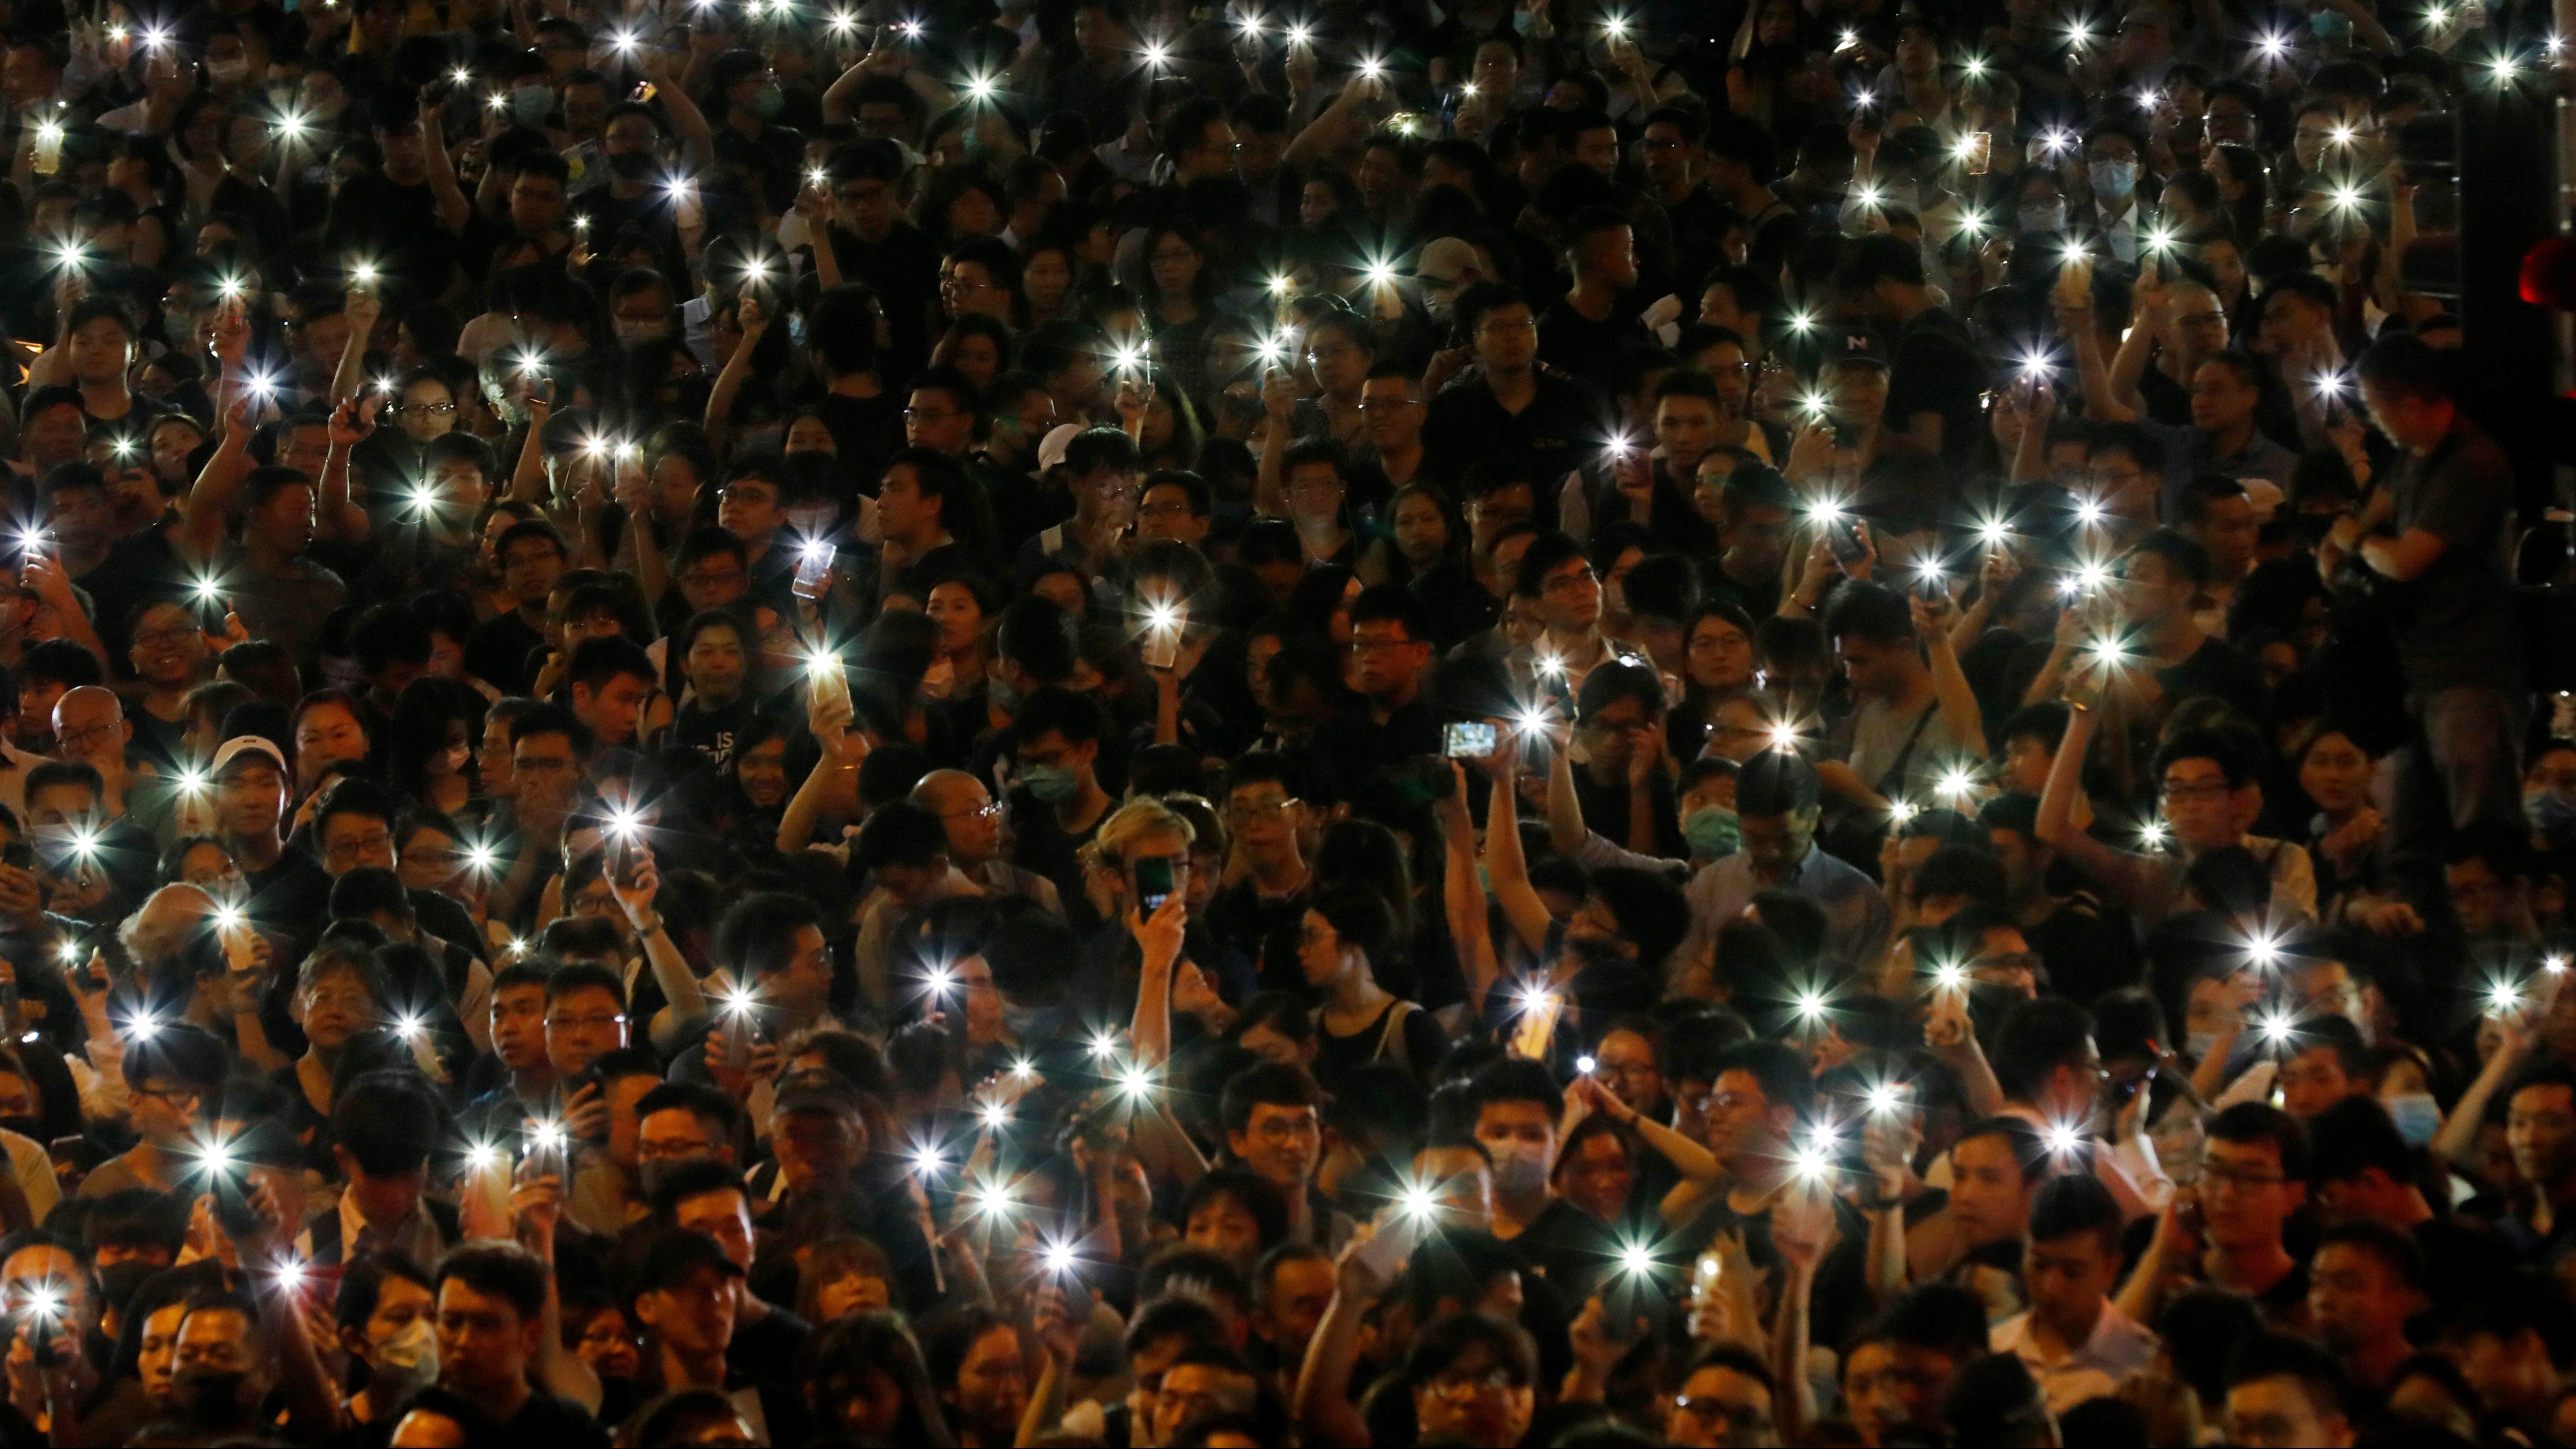 Hong Kong protestors use Bridgefy to preempt internet